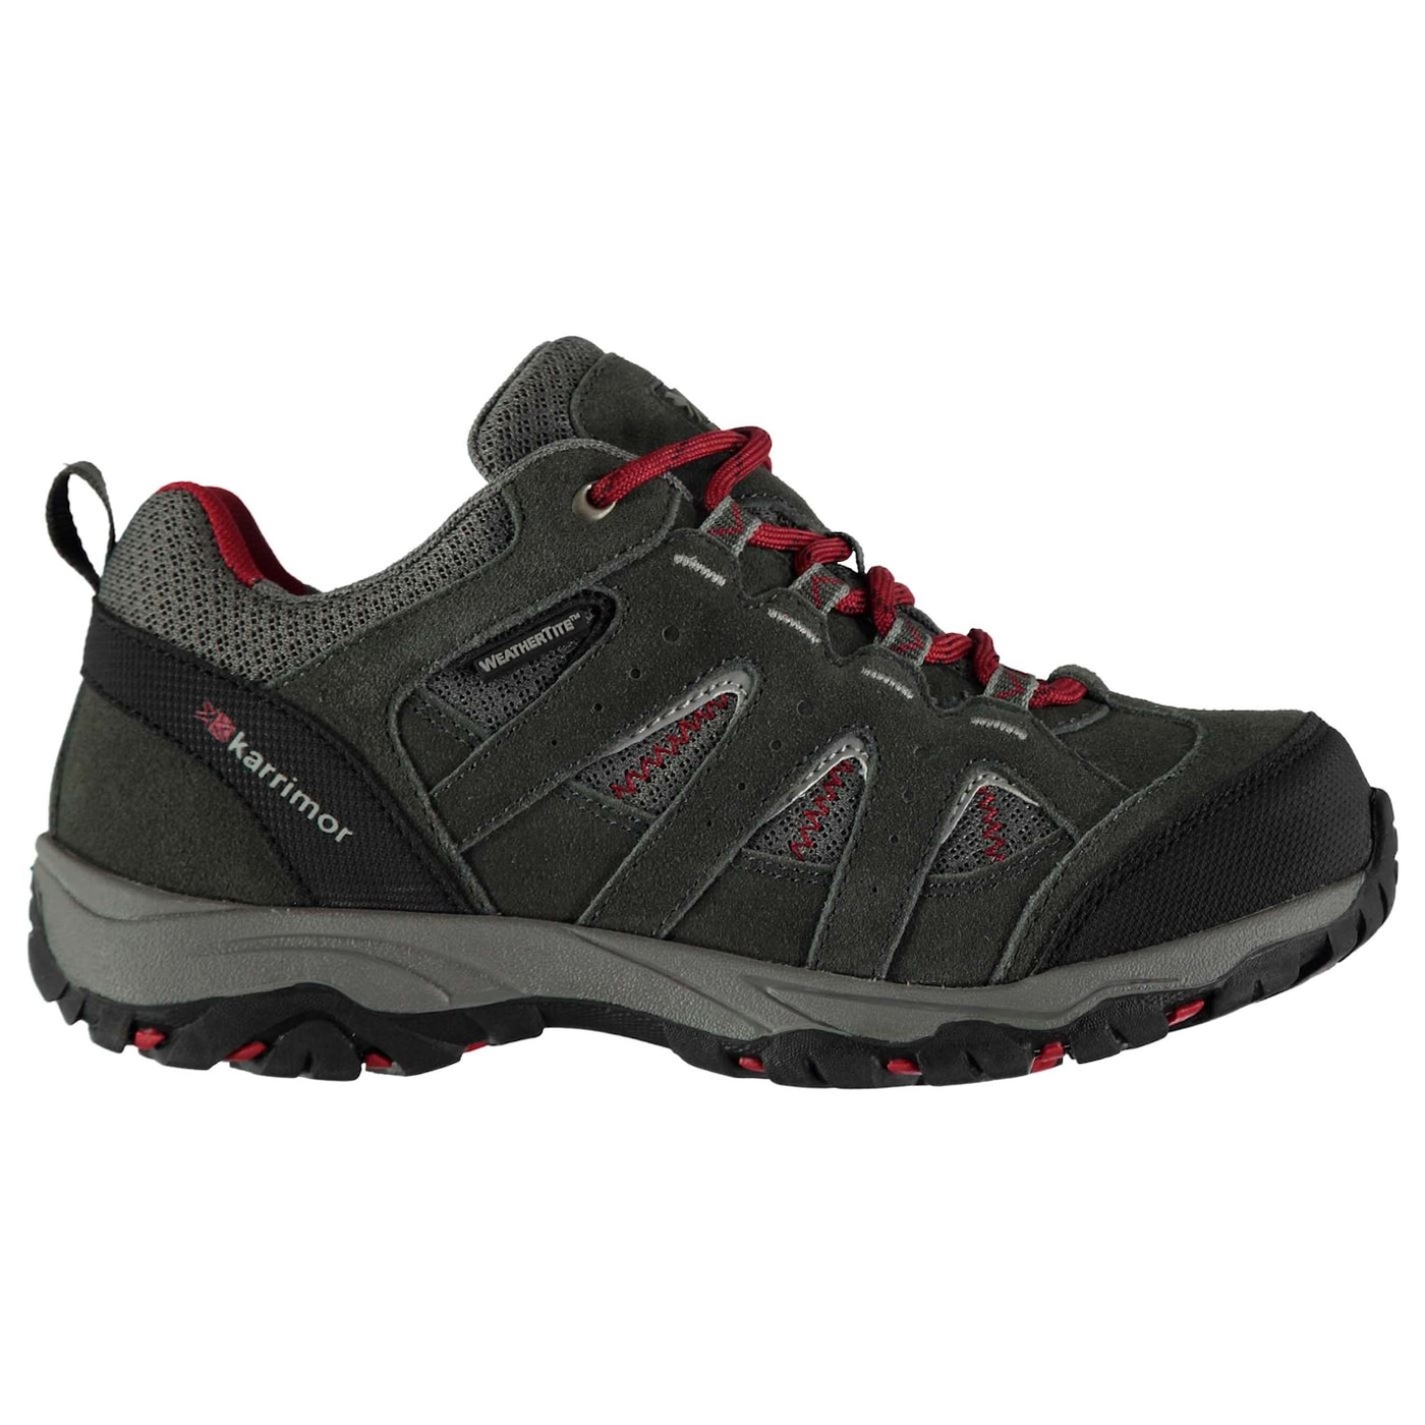 Karrimor Mount Low Junior Waterproof Walking Shoes